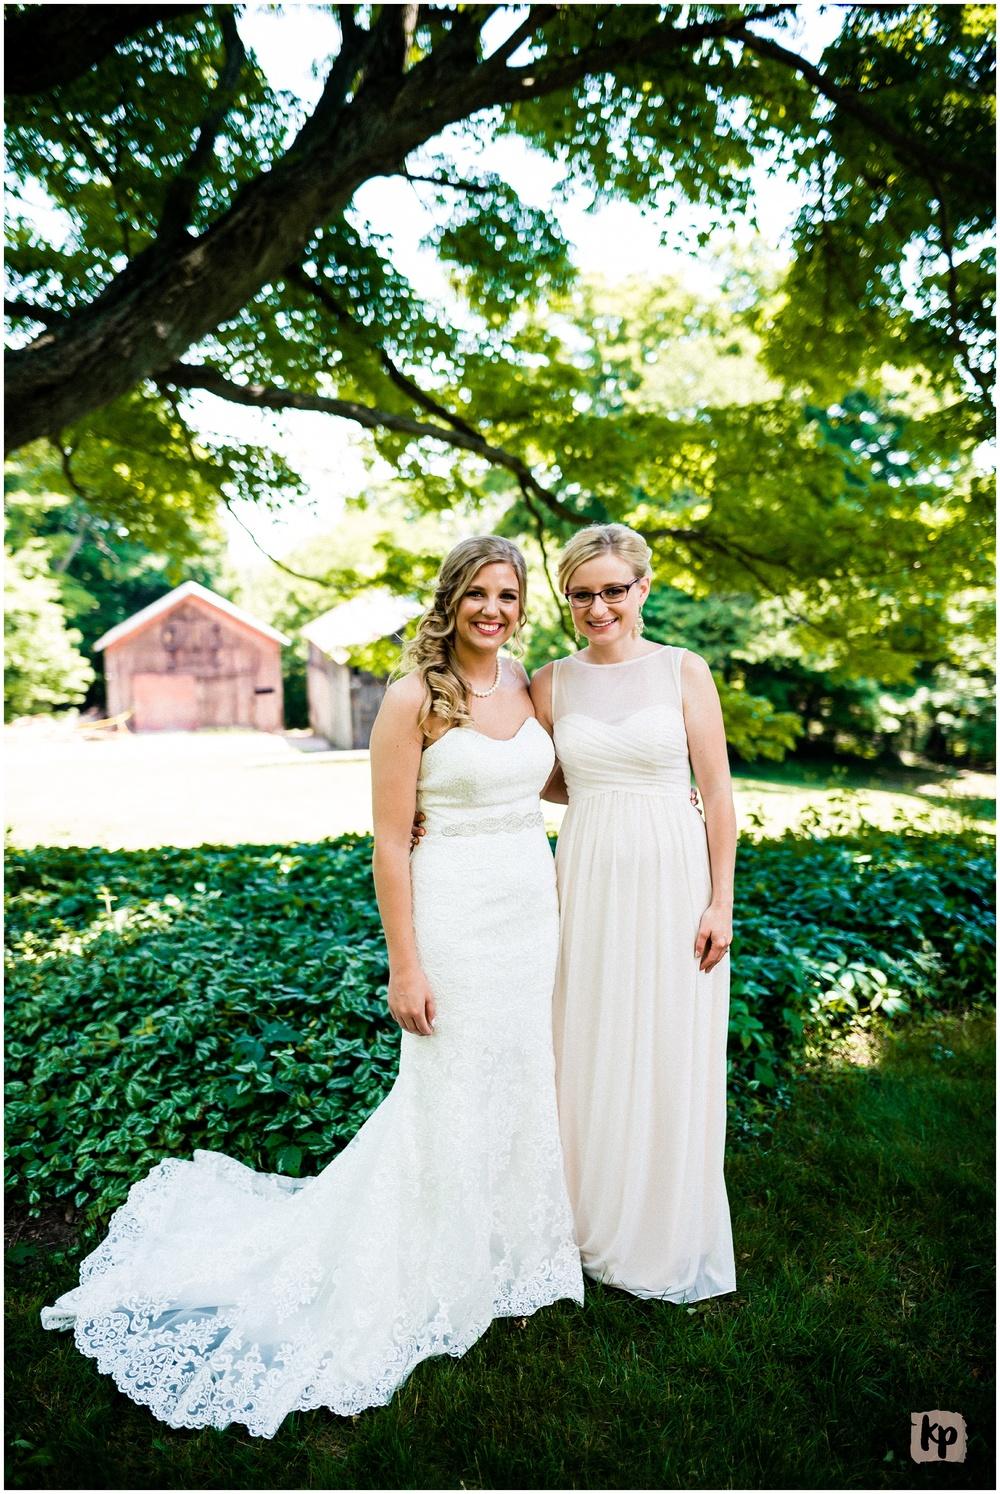 Matthieu + Katlyn | Just Married #kyleepaigephotography_0075.jpg